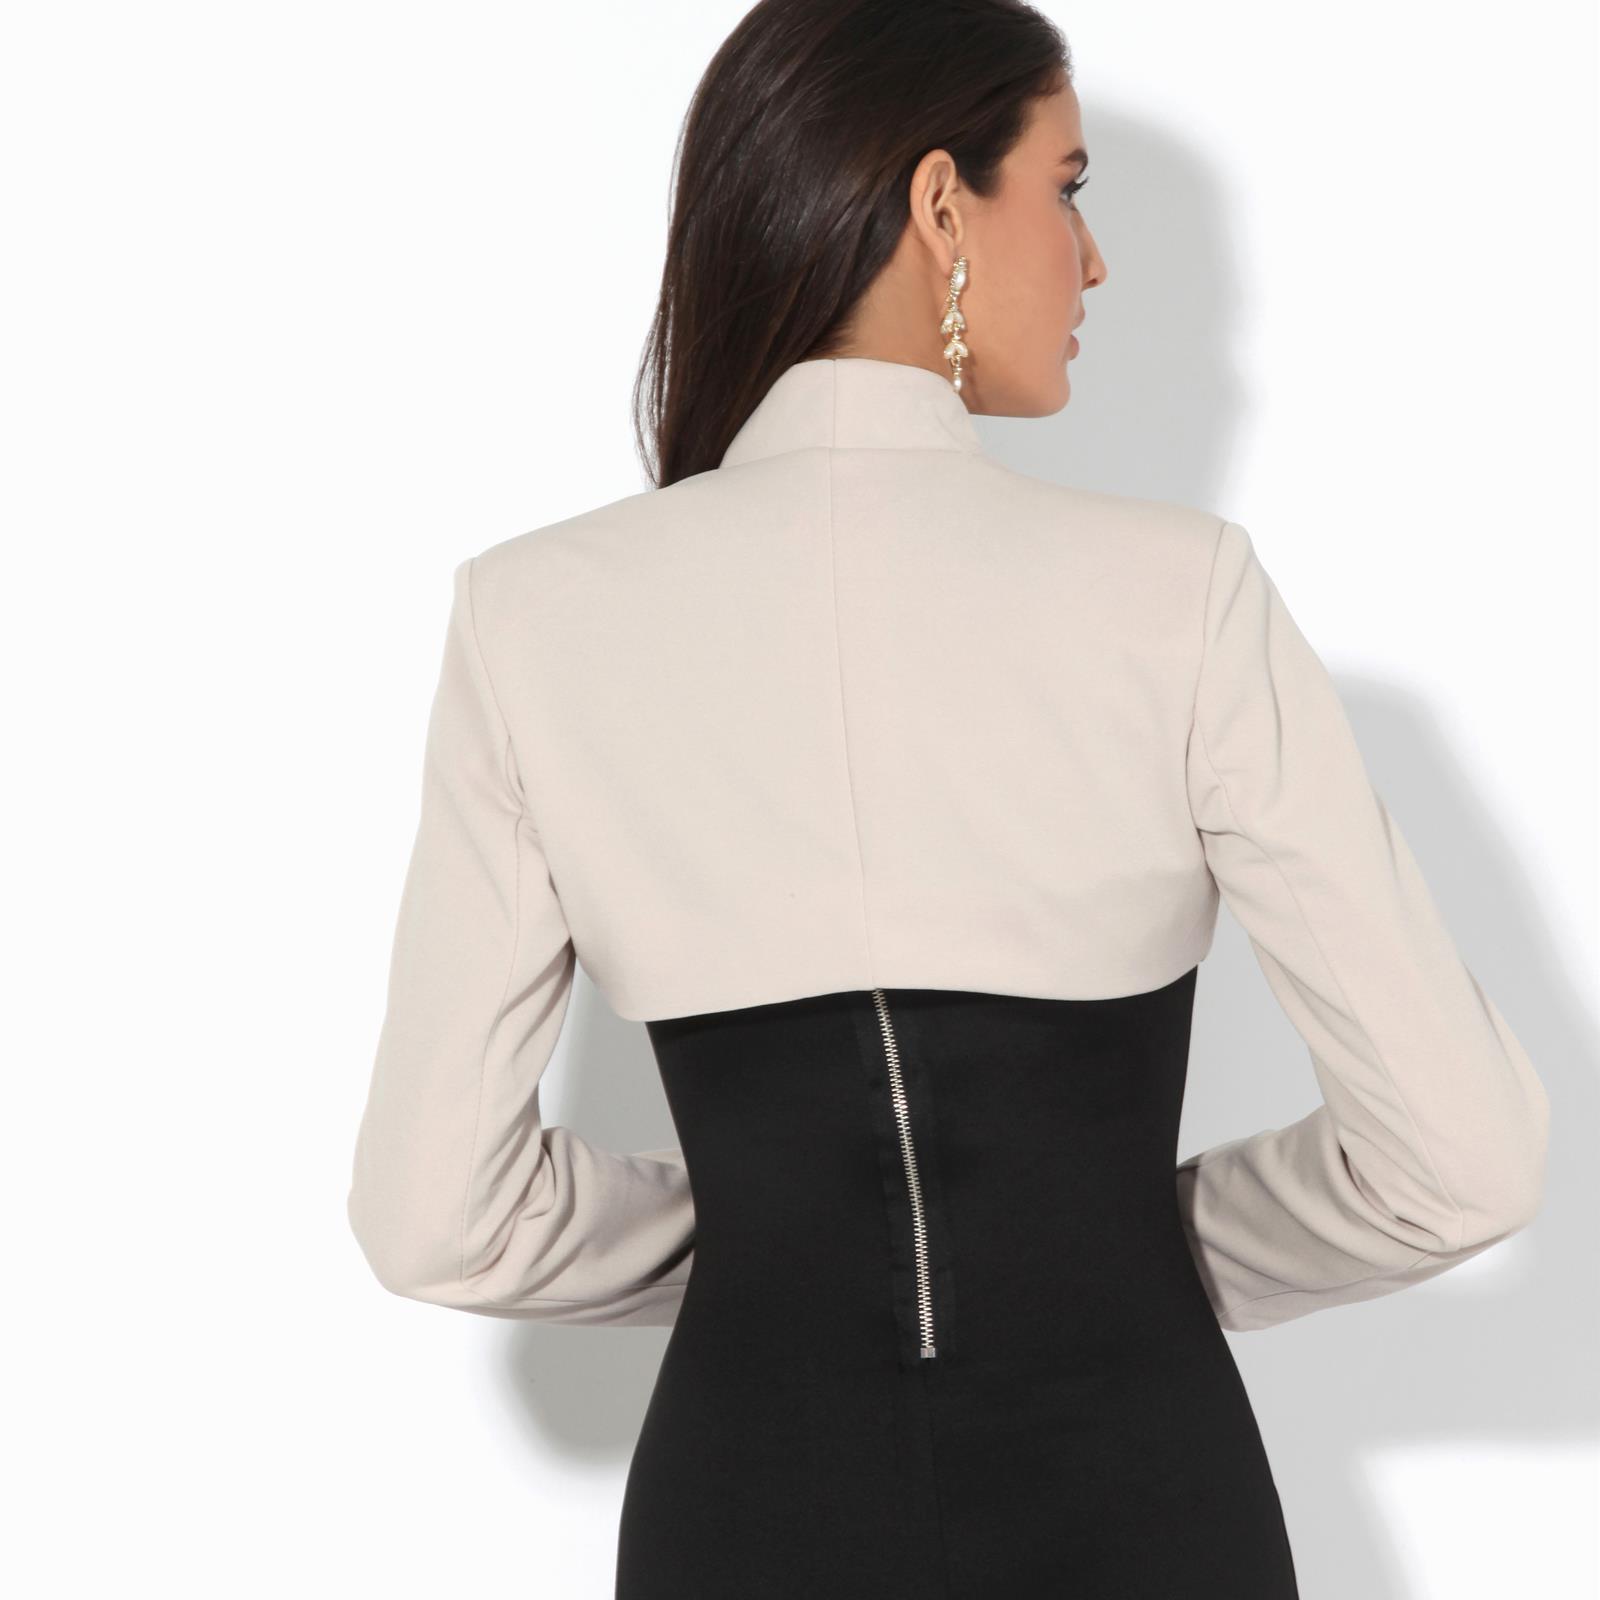 Womens-Ladies-Bolero-Jacket-Shrug-Chiffon-Long-Sleeve-Crop-Top-Blazer-Coat-Party thumbnail 11